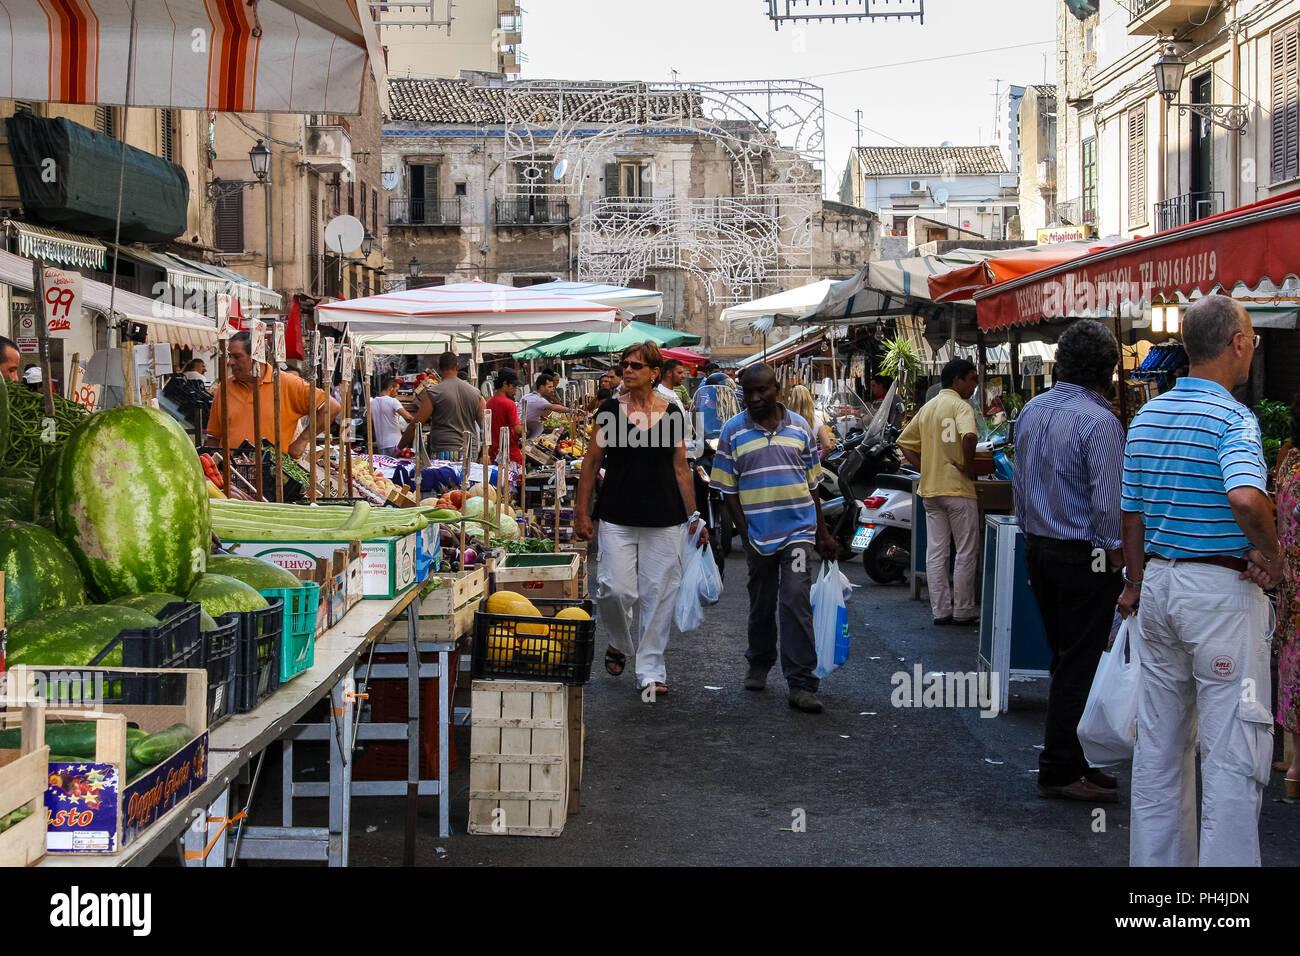 Ballarò Food Market, Palermo, Sicily - Stock Image